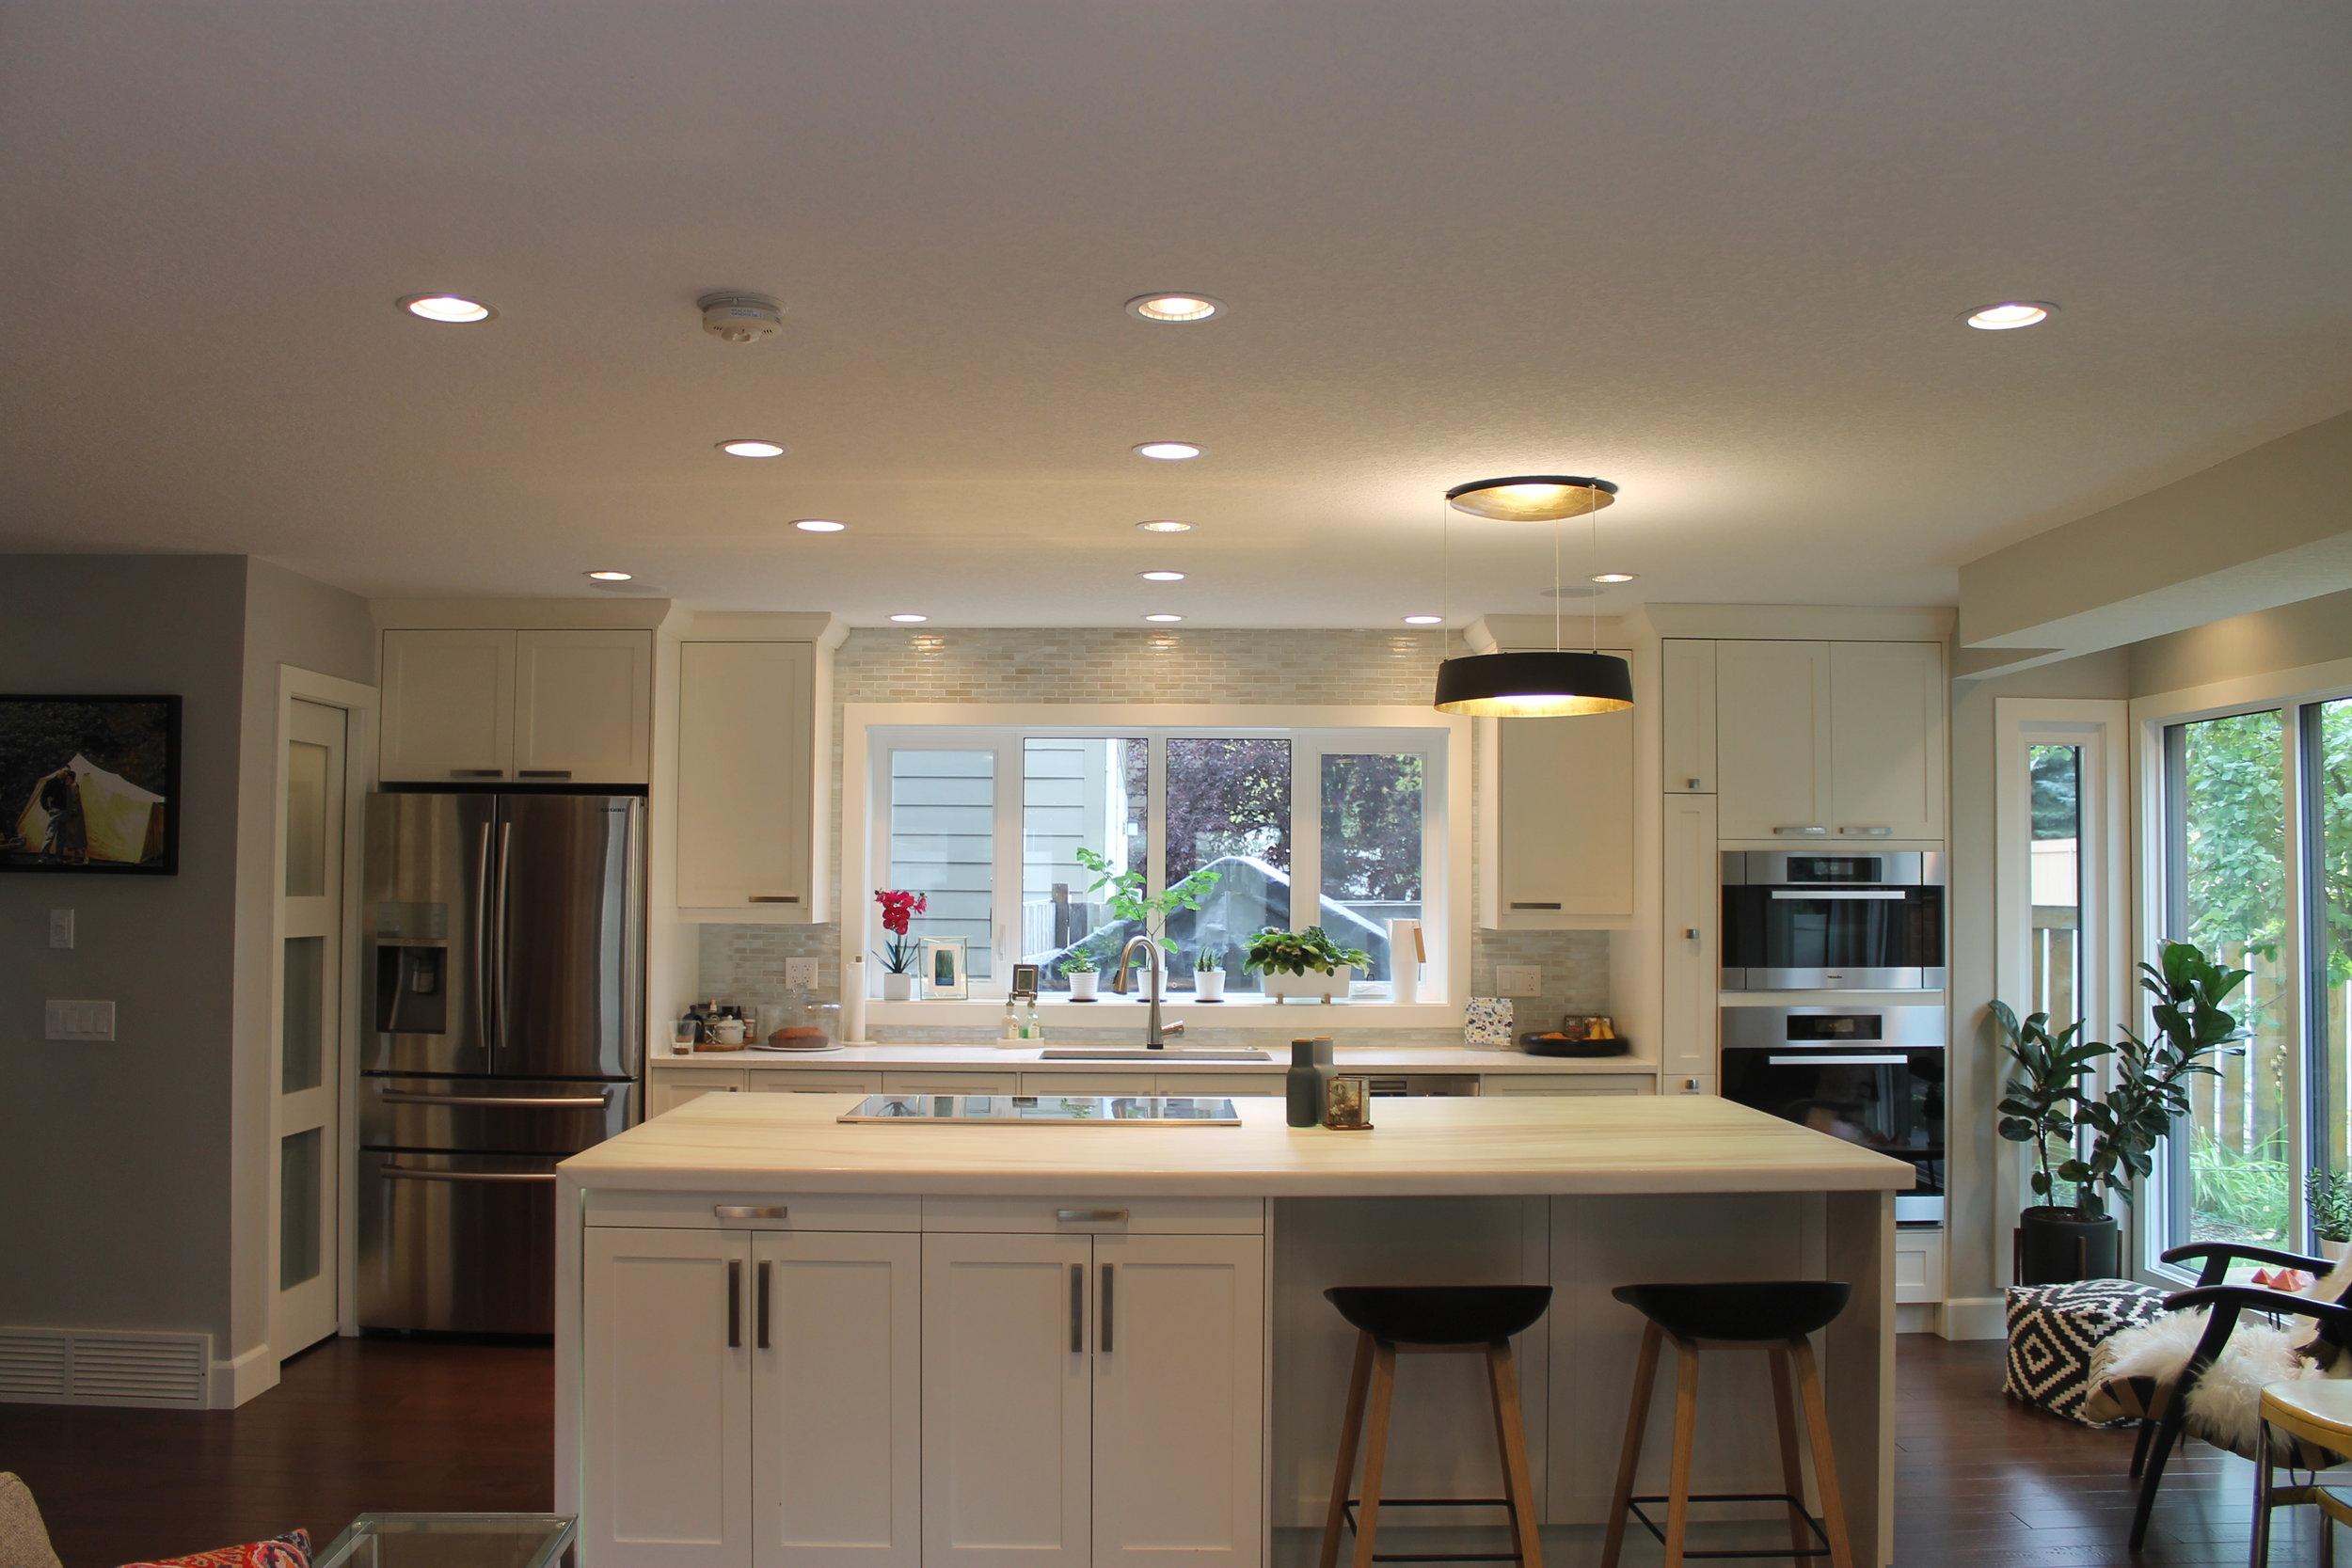 kitchen (home 1)